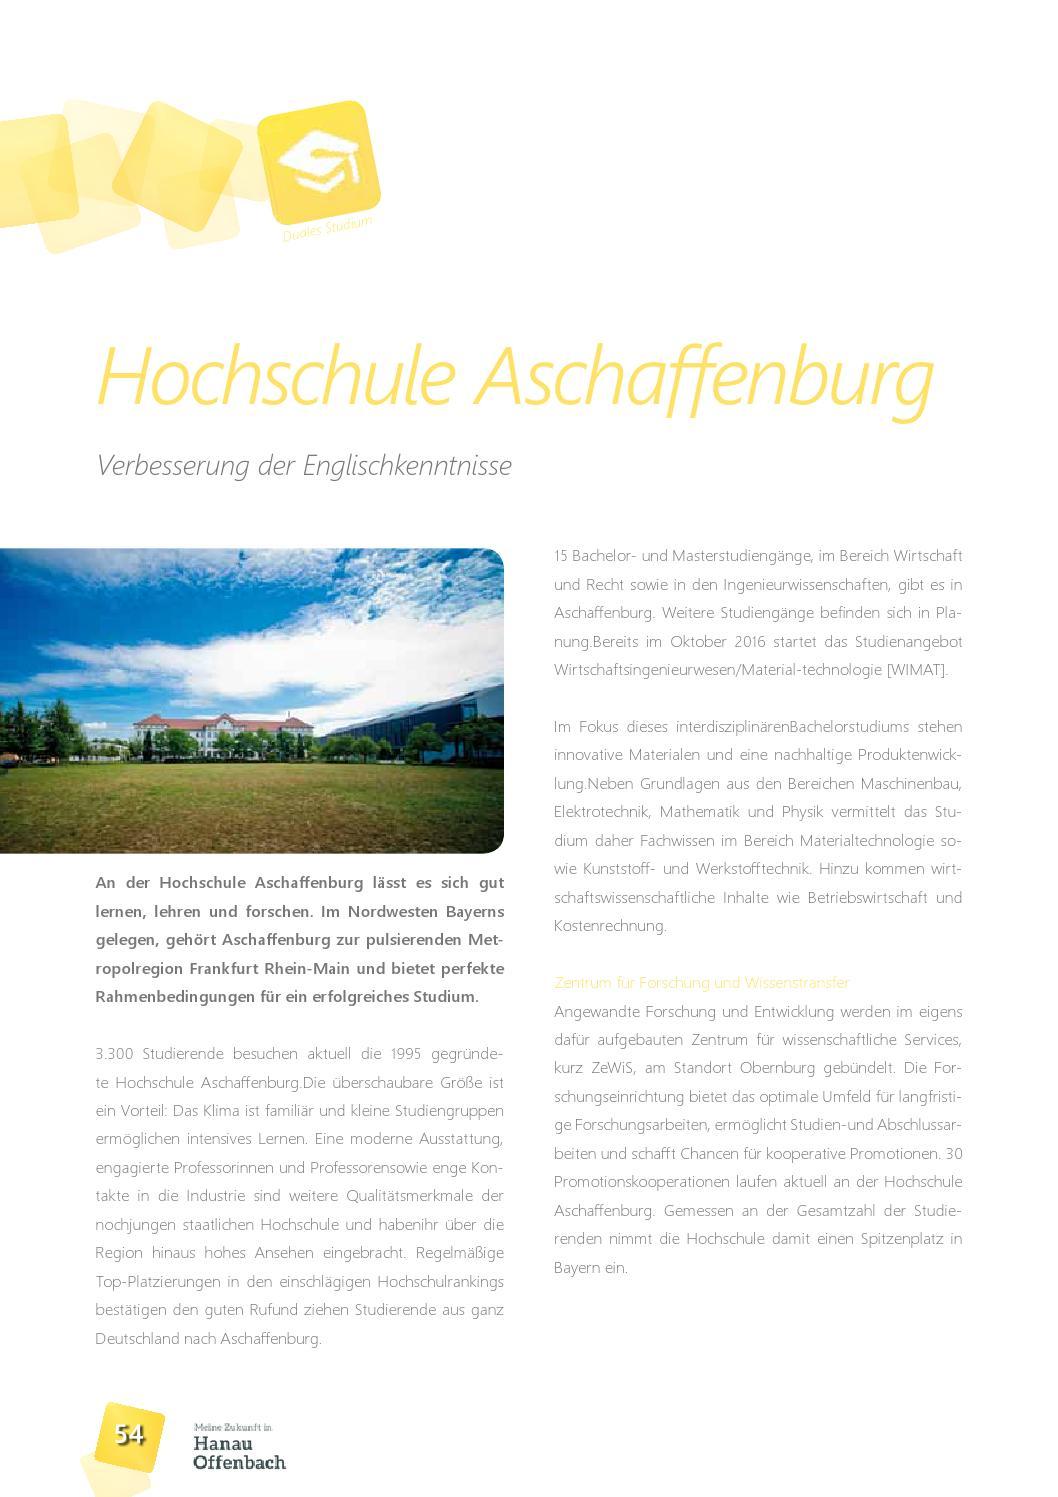 Meine zukunft in hanau offenbach 2016 das for Maschinenbau offenbach